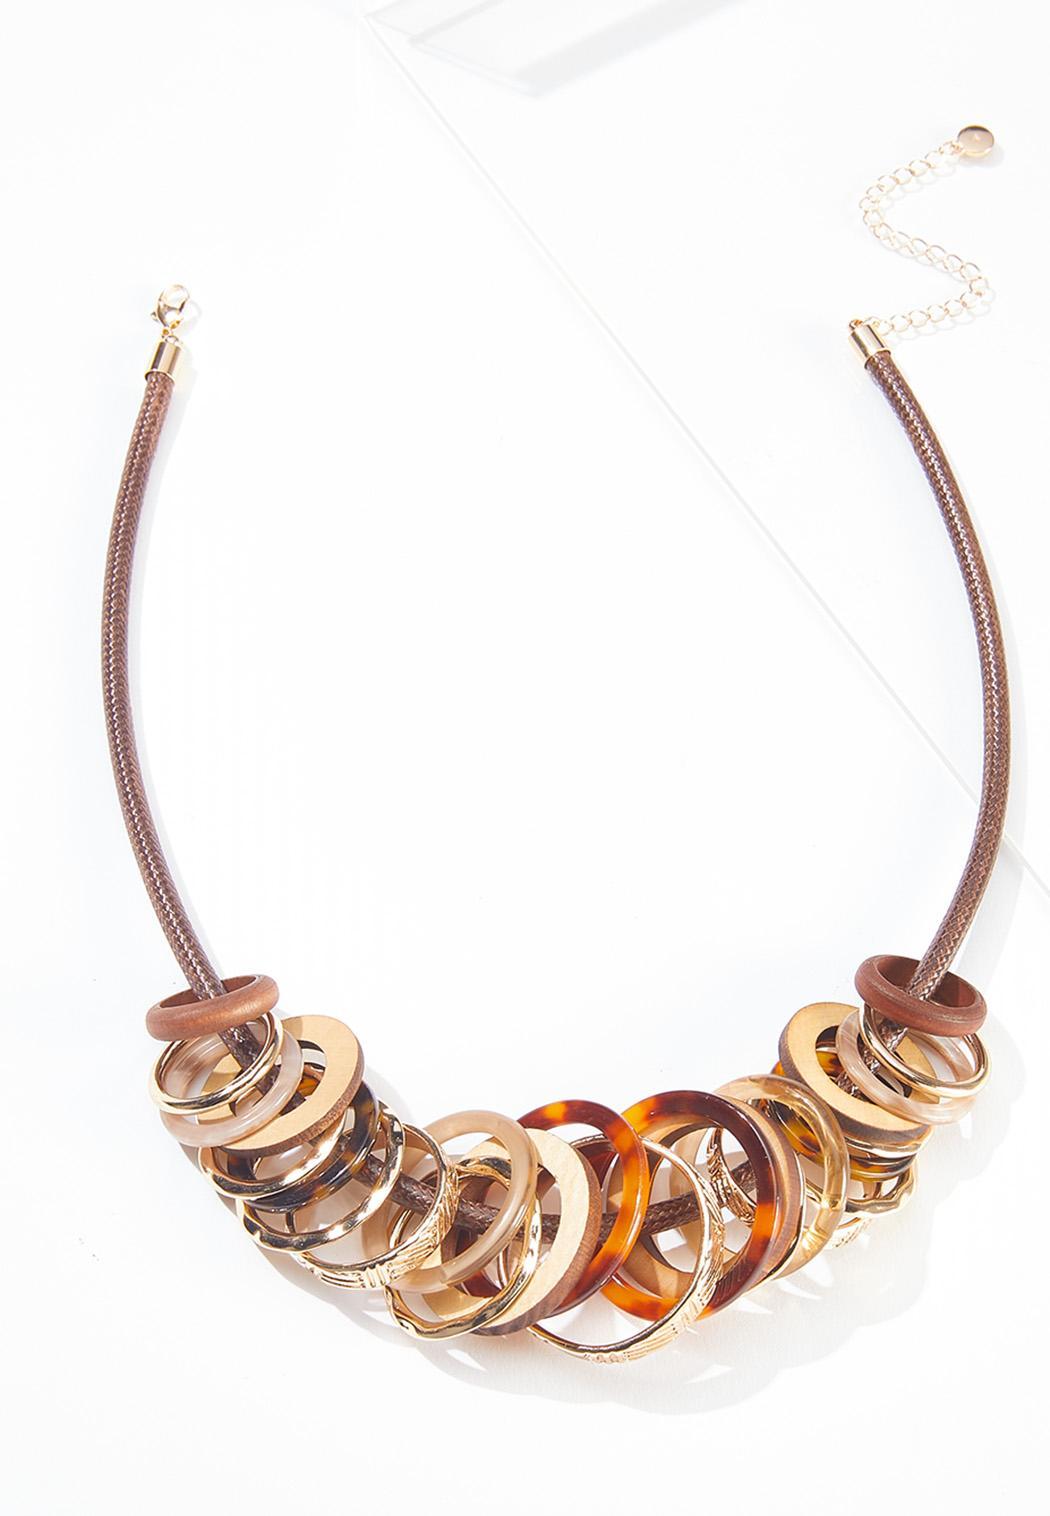 Mixed Circle Cord Necklace